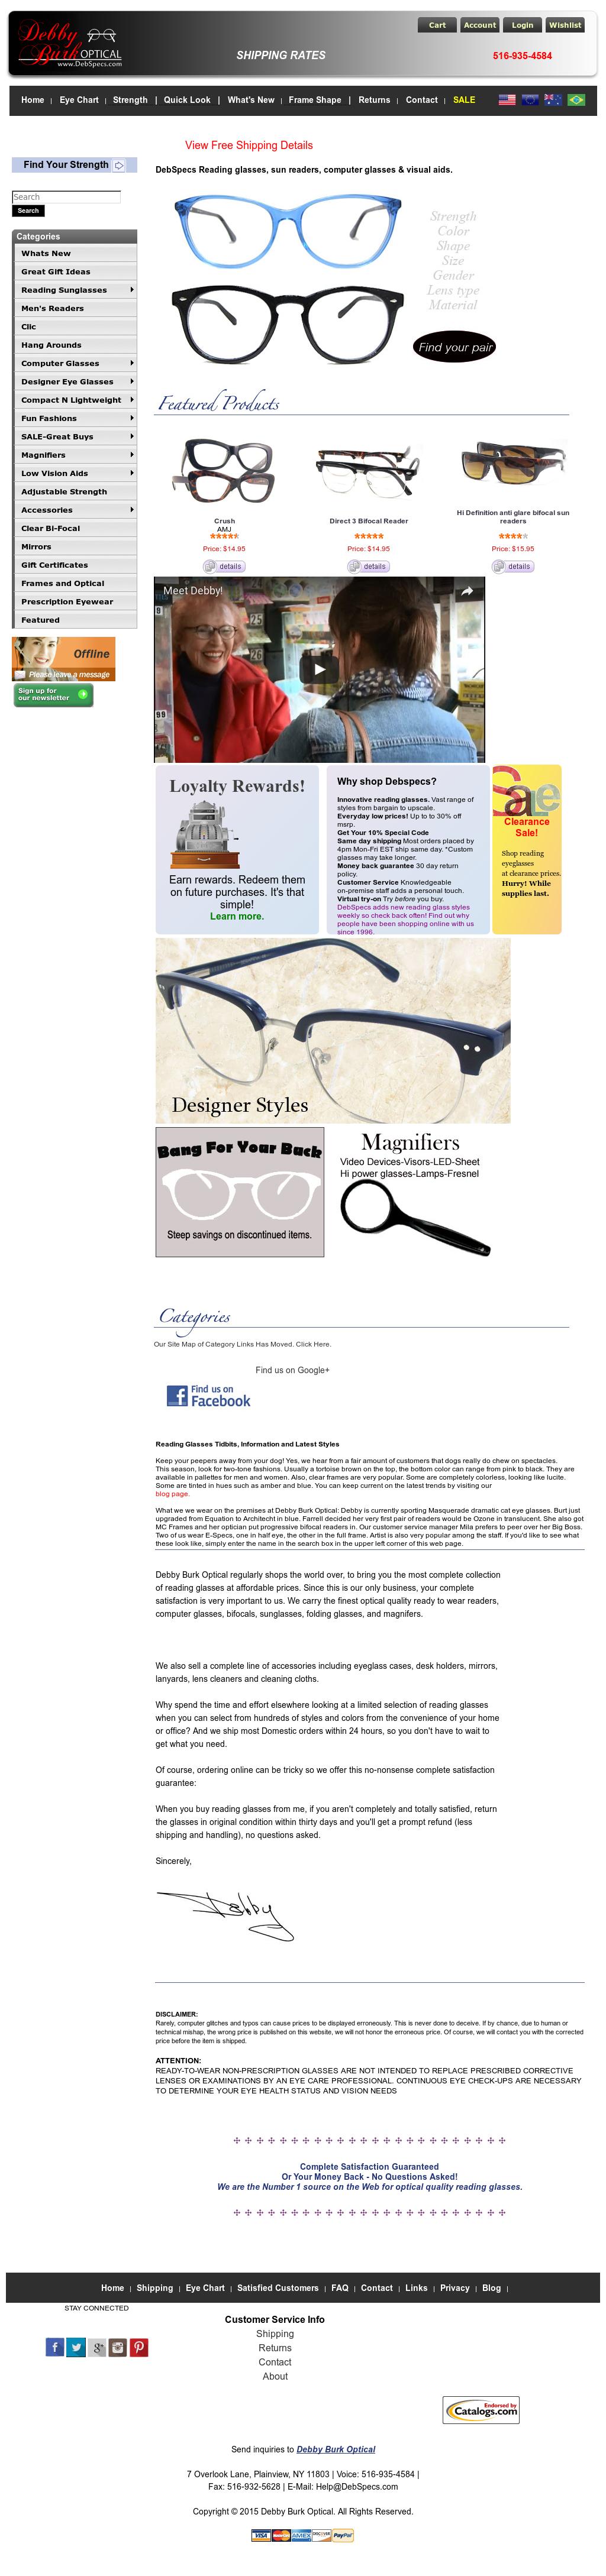 3911c763fade Deb Specs Competitors, Revenue and Employees - Owler Company Profile